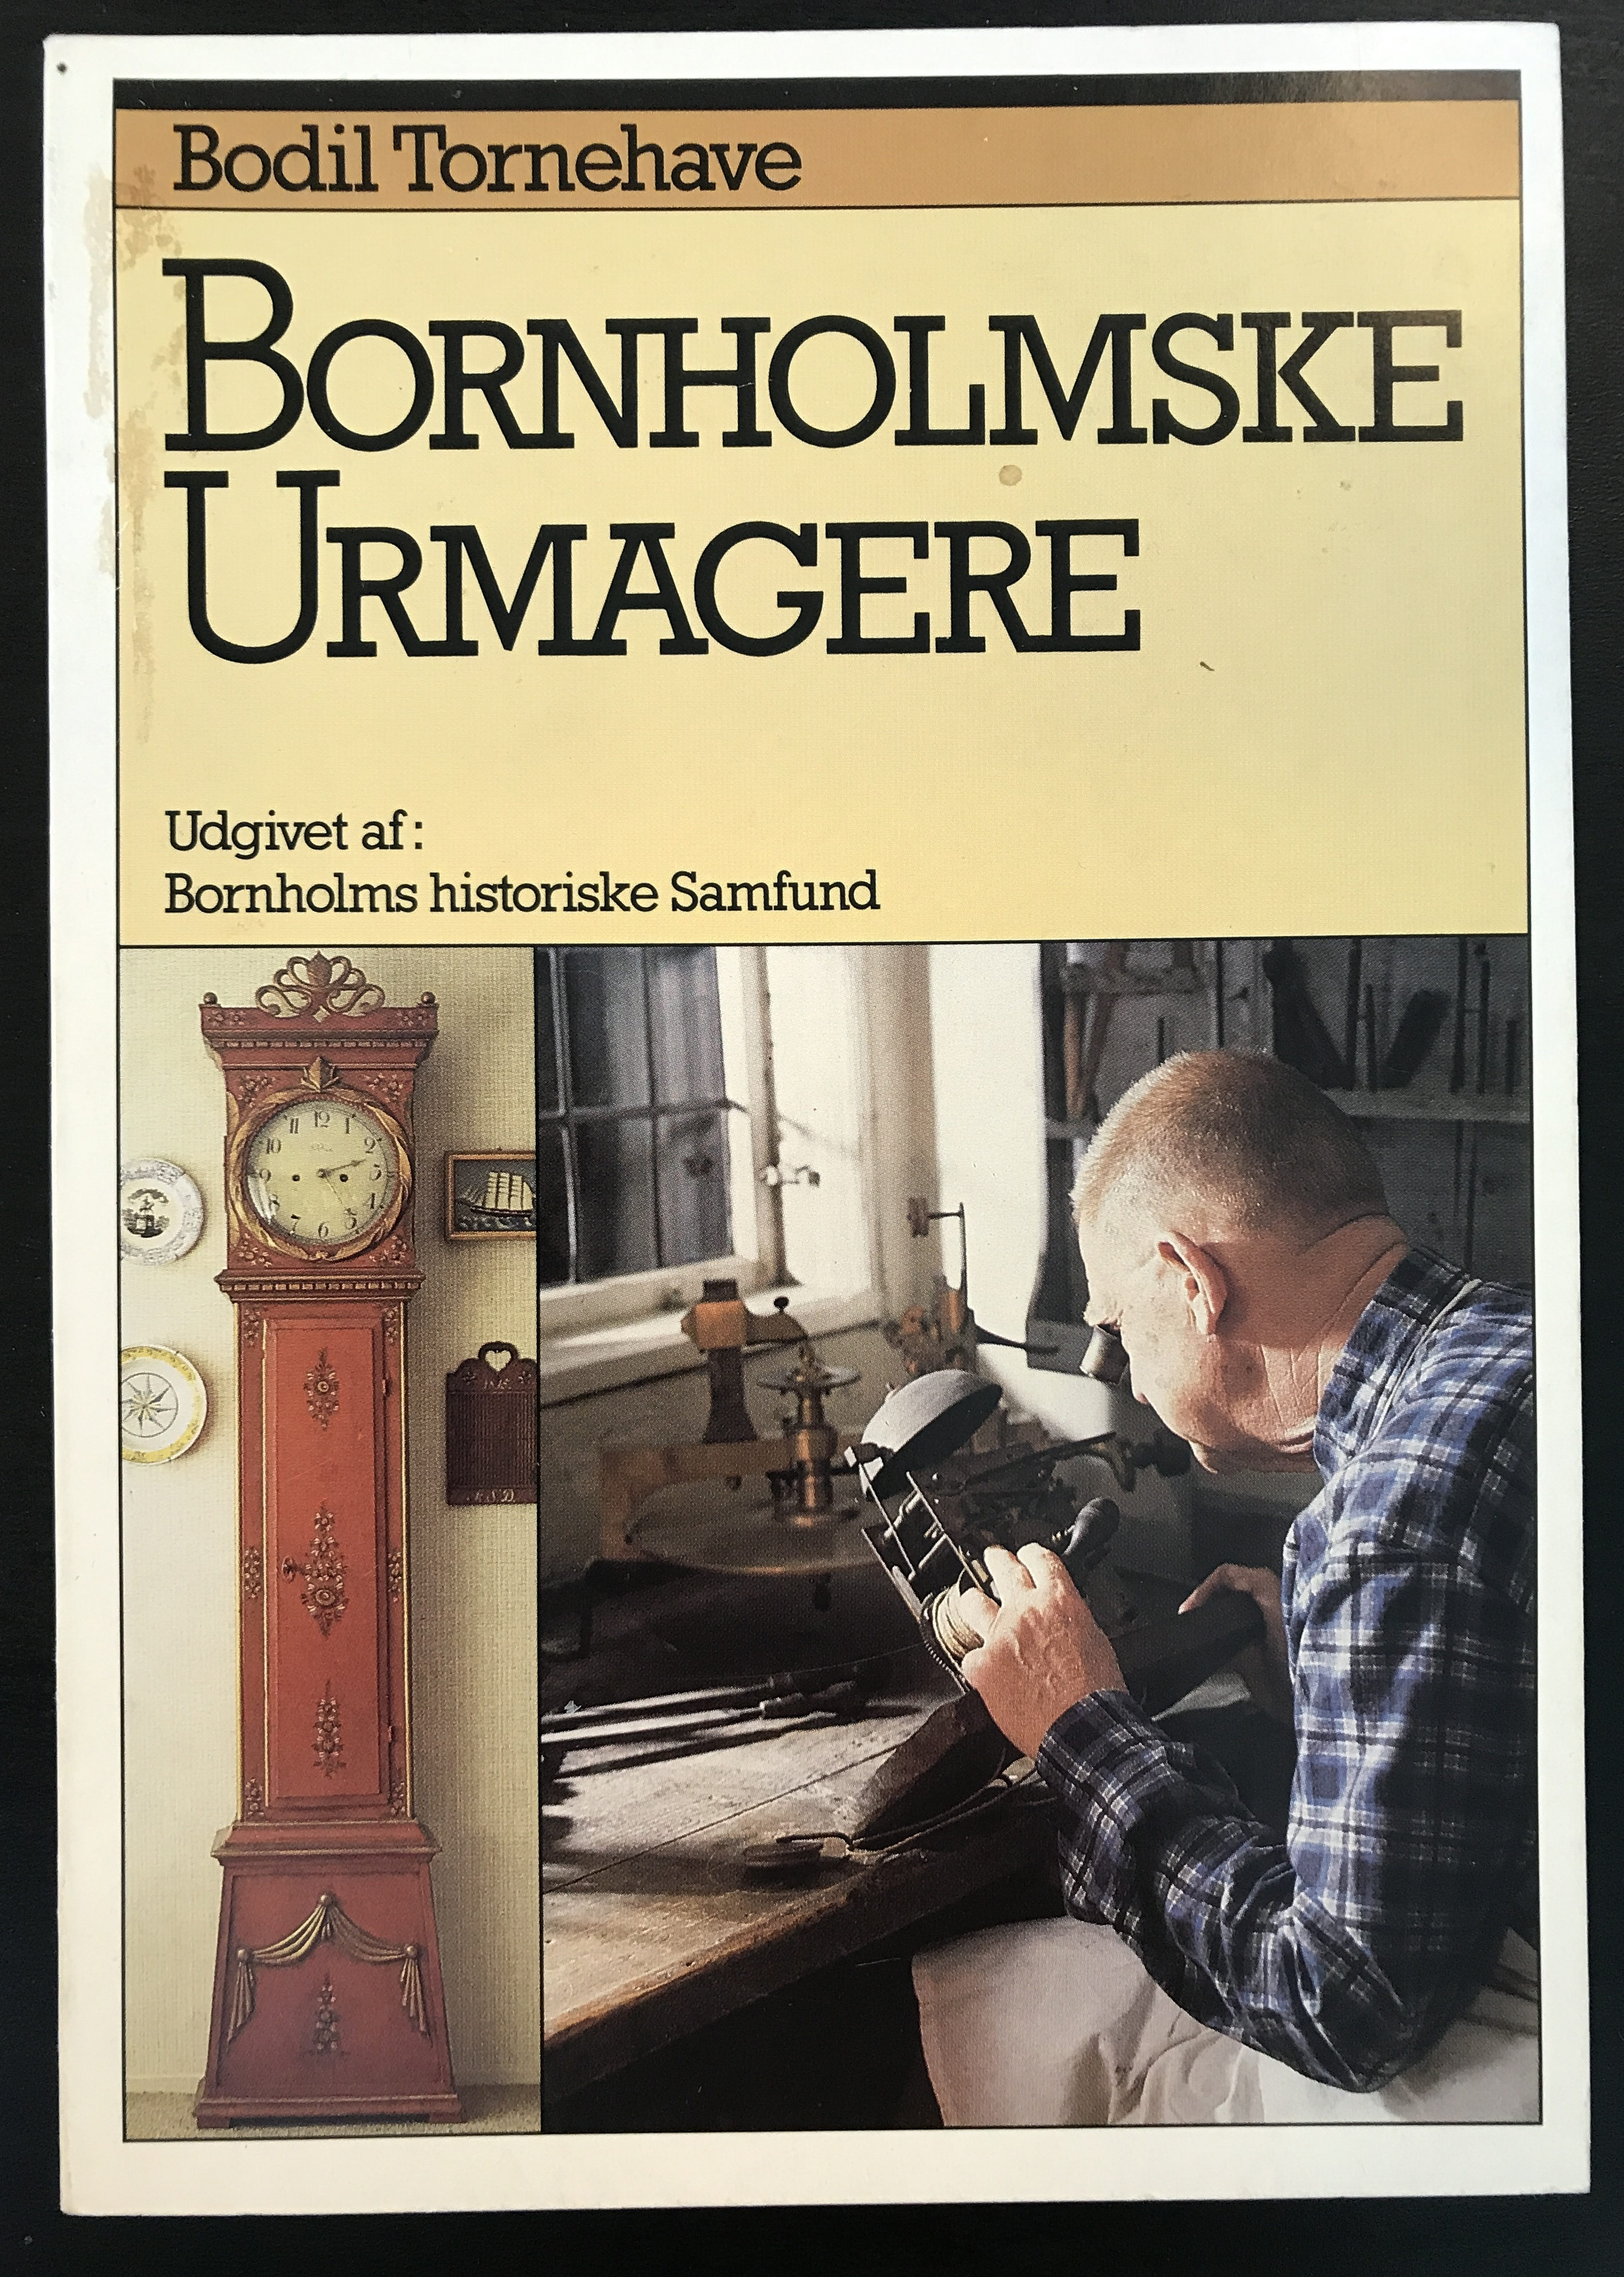 bornholmske urmagere